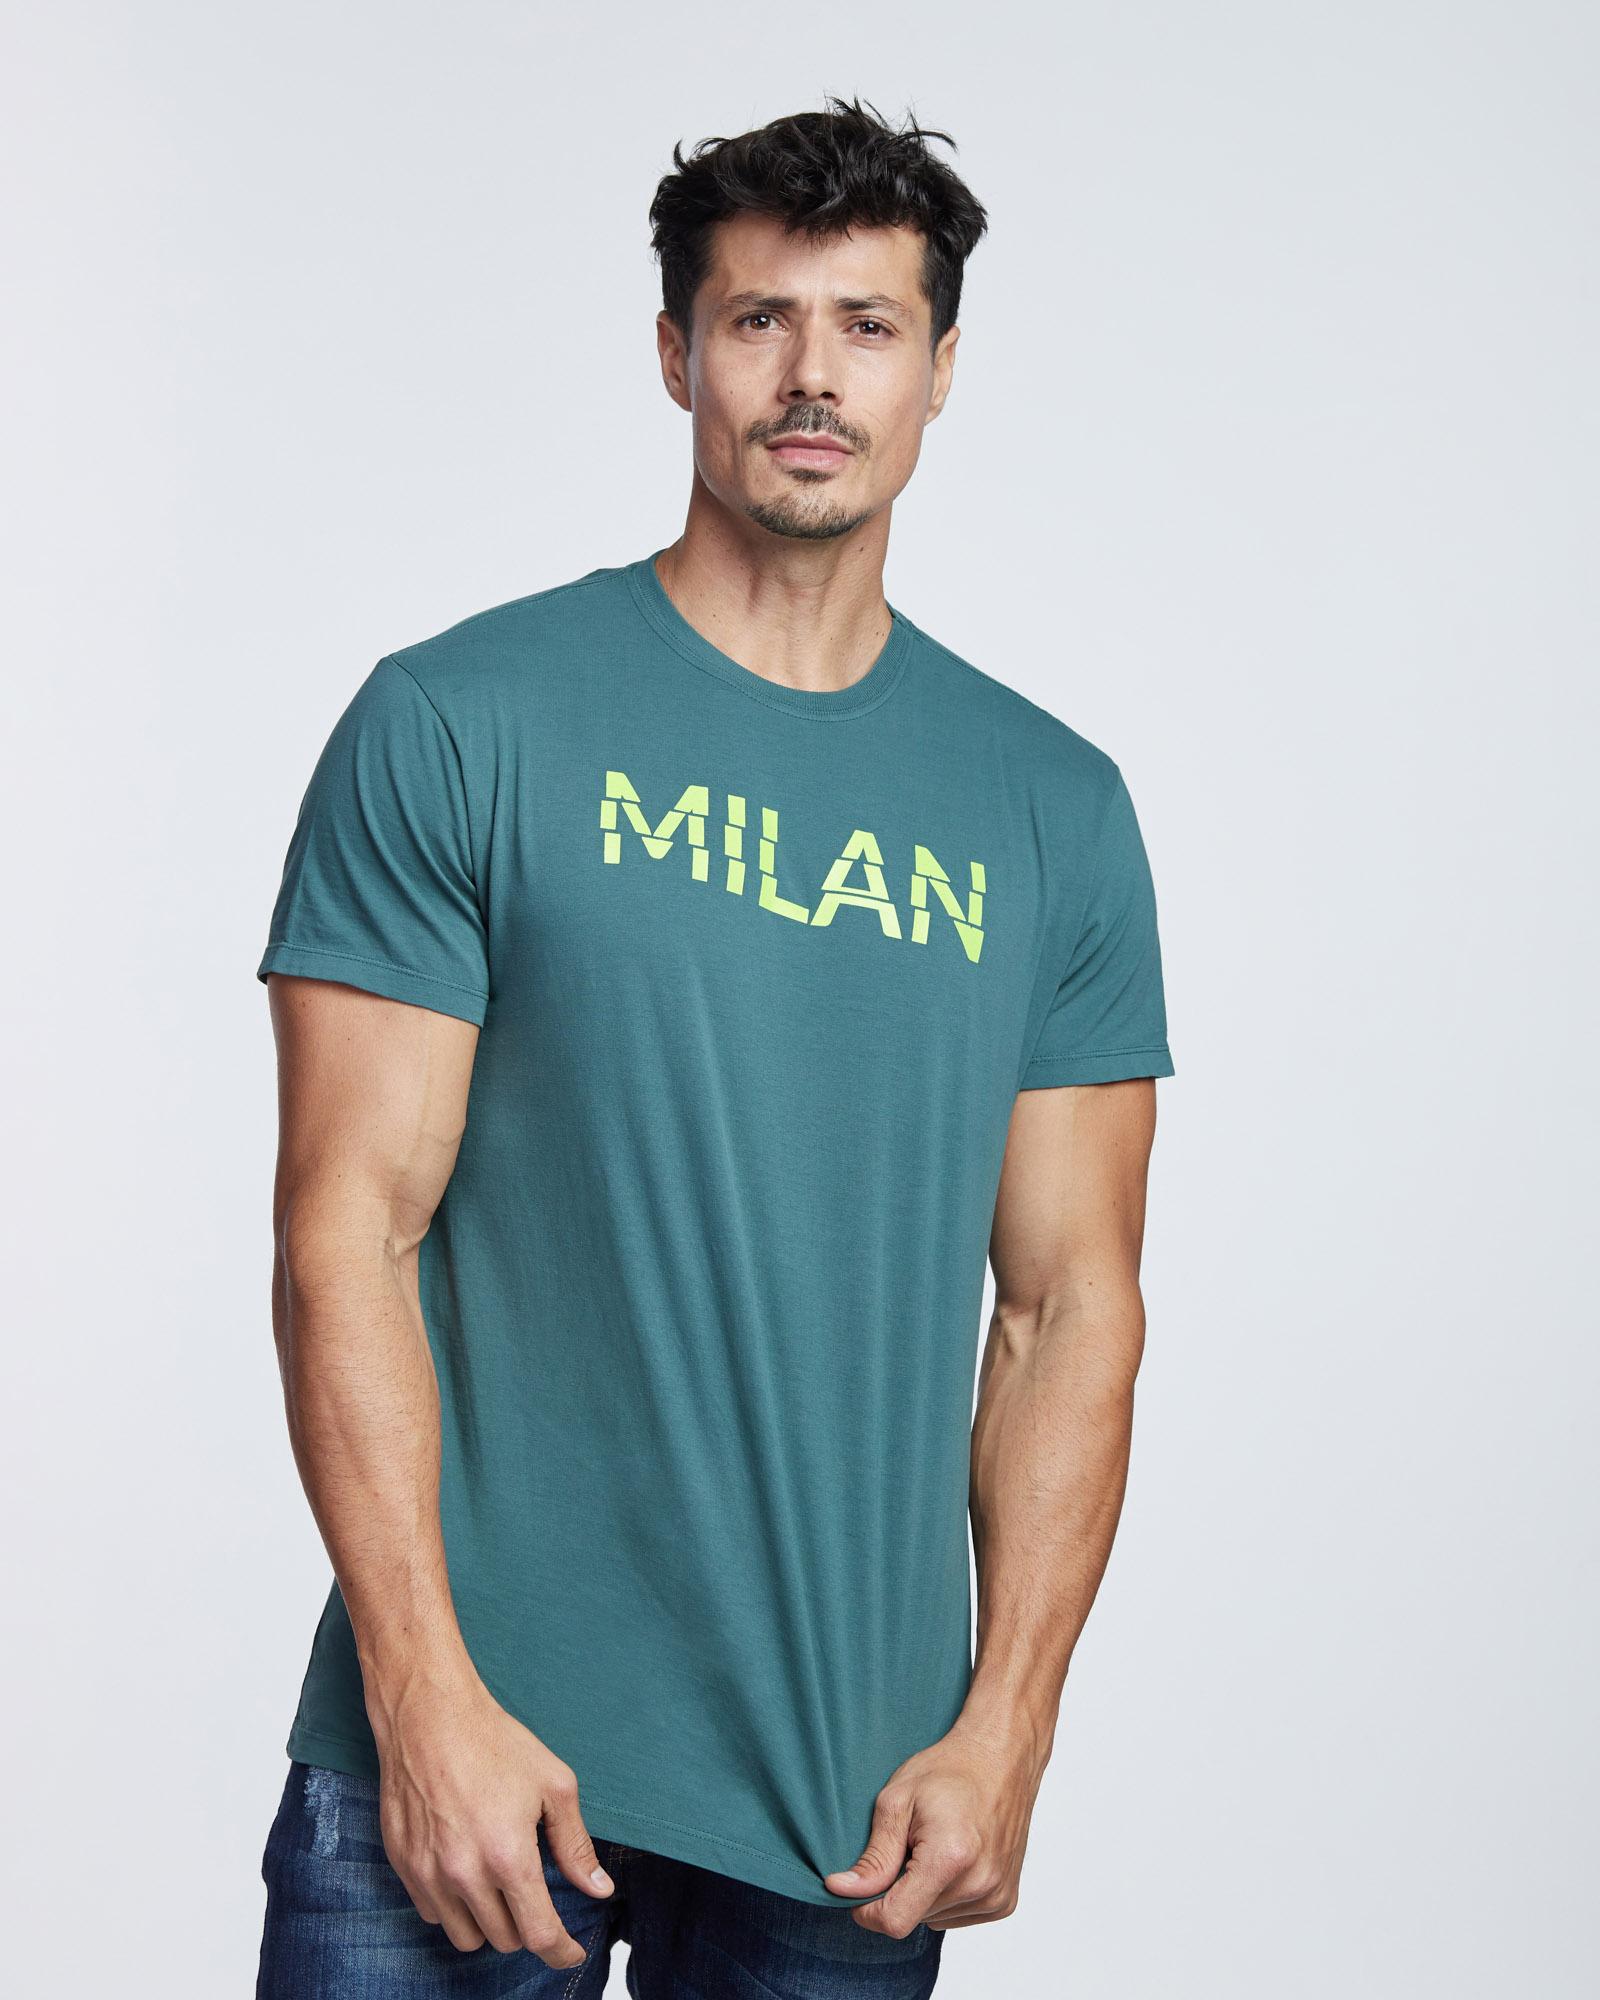 Camiseta Milan Masculina Evolvee